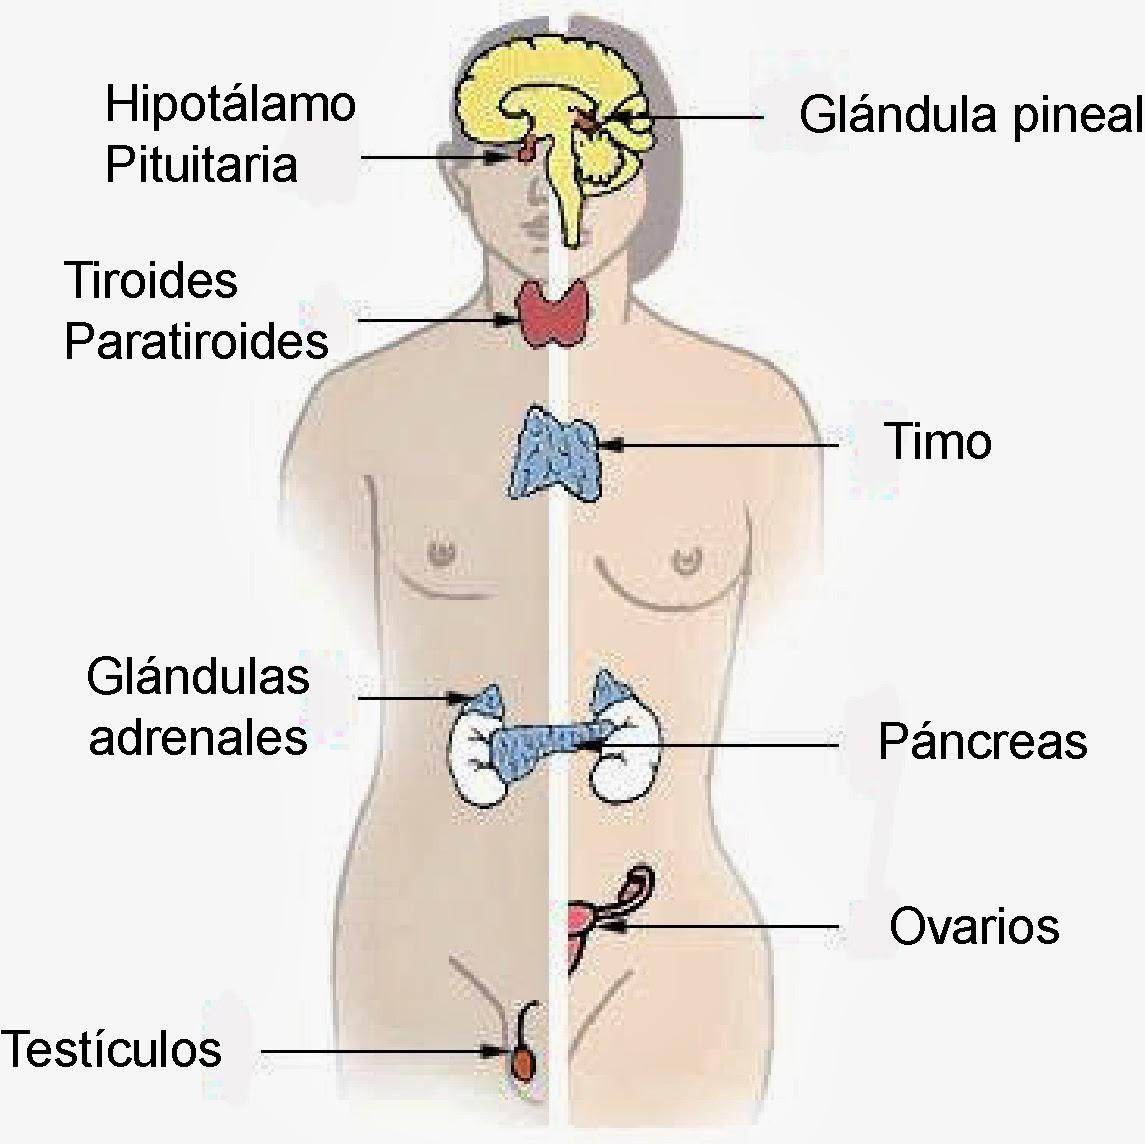 Glándulas endocrinas clásicas